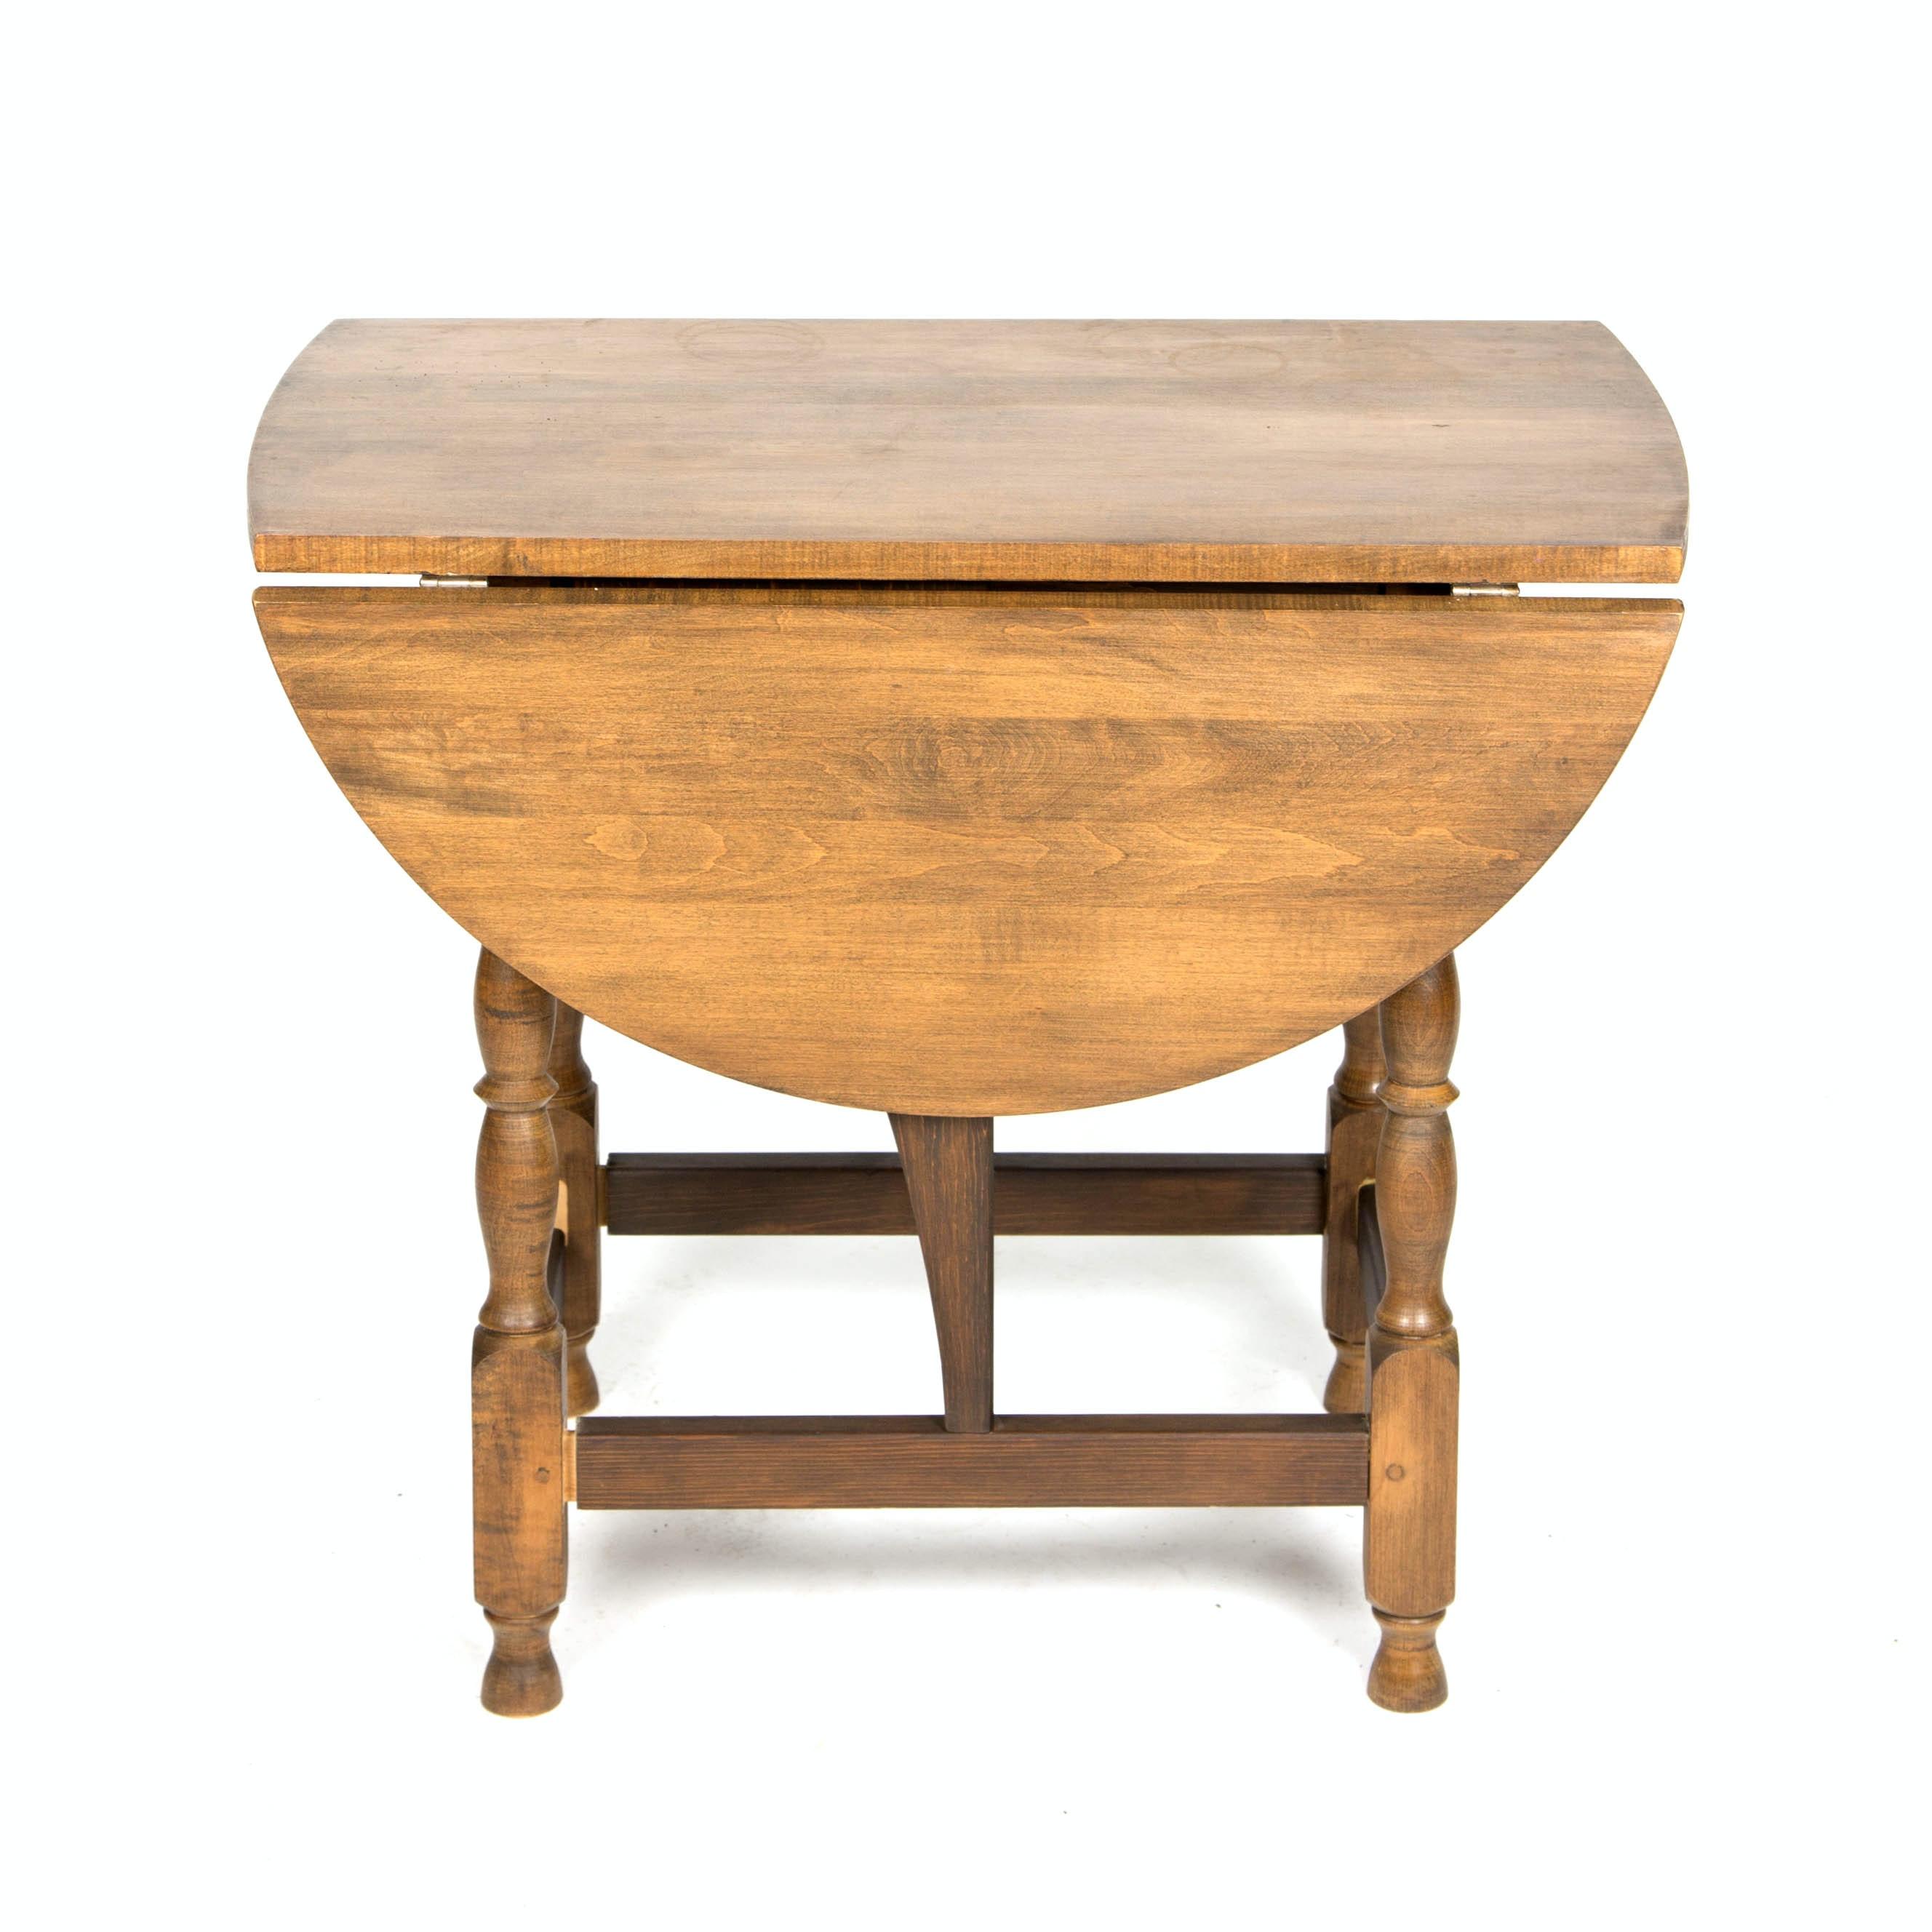 Vintage Drop-Leaf Table